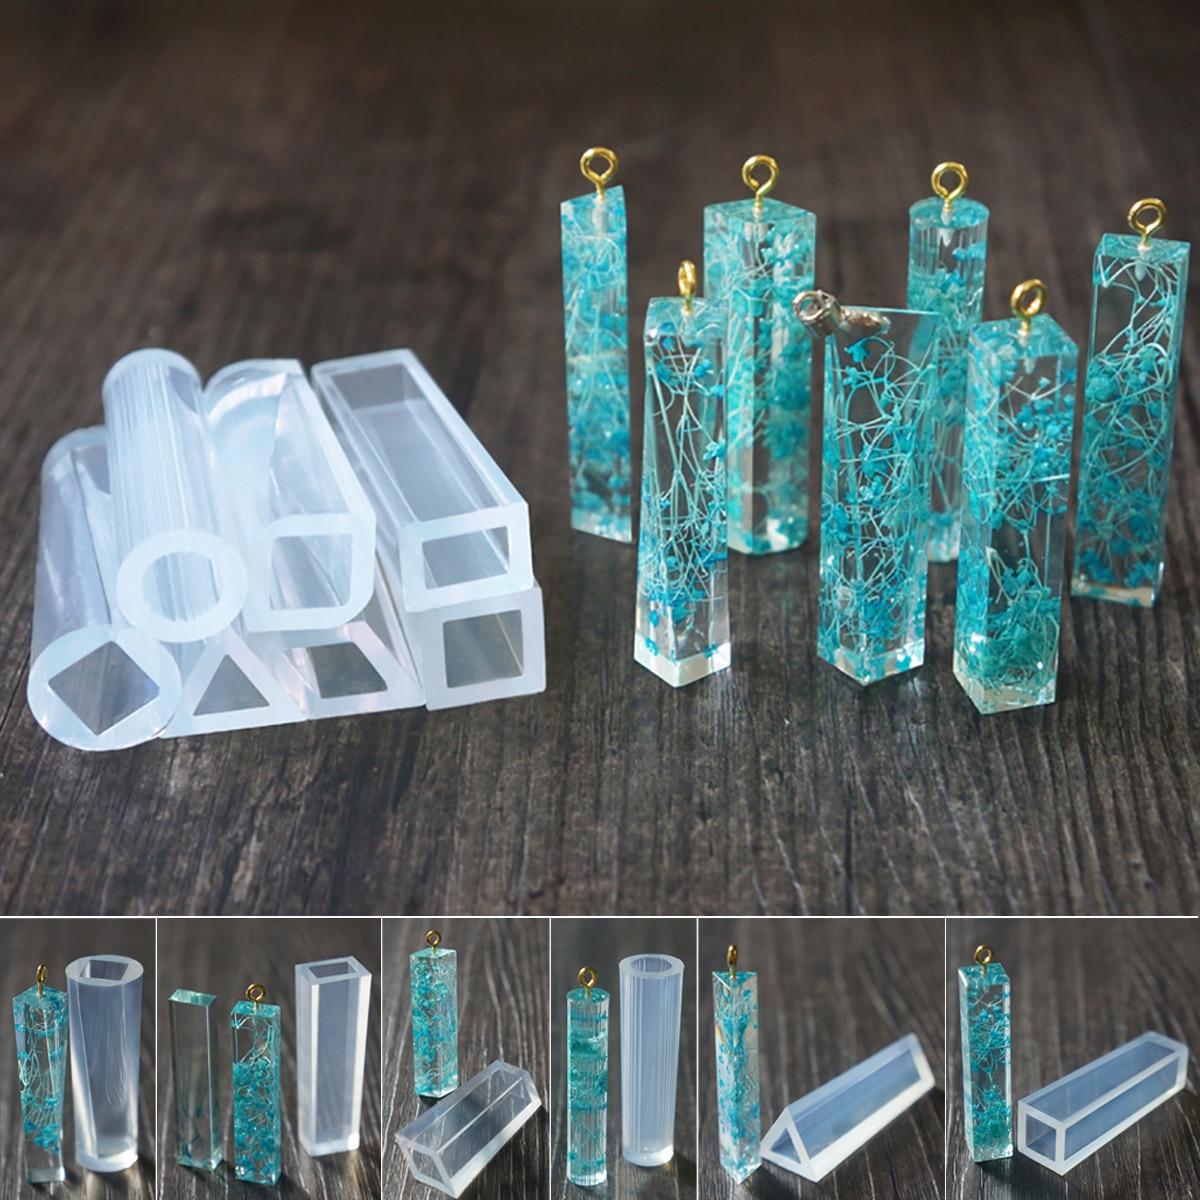 7pcs Mix Style Pendant Fashion Scrapbooking Silicone Mould DIY Epoxy Resin Decorative Craft Jewelry Making Mold